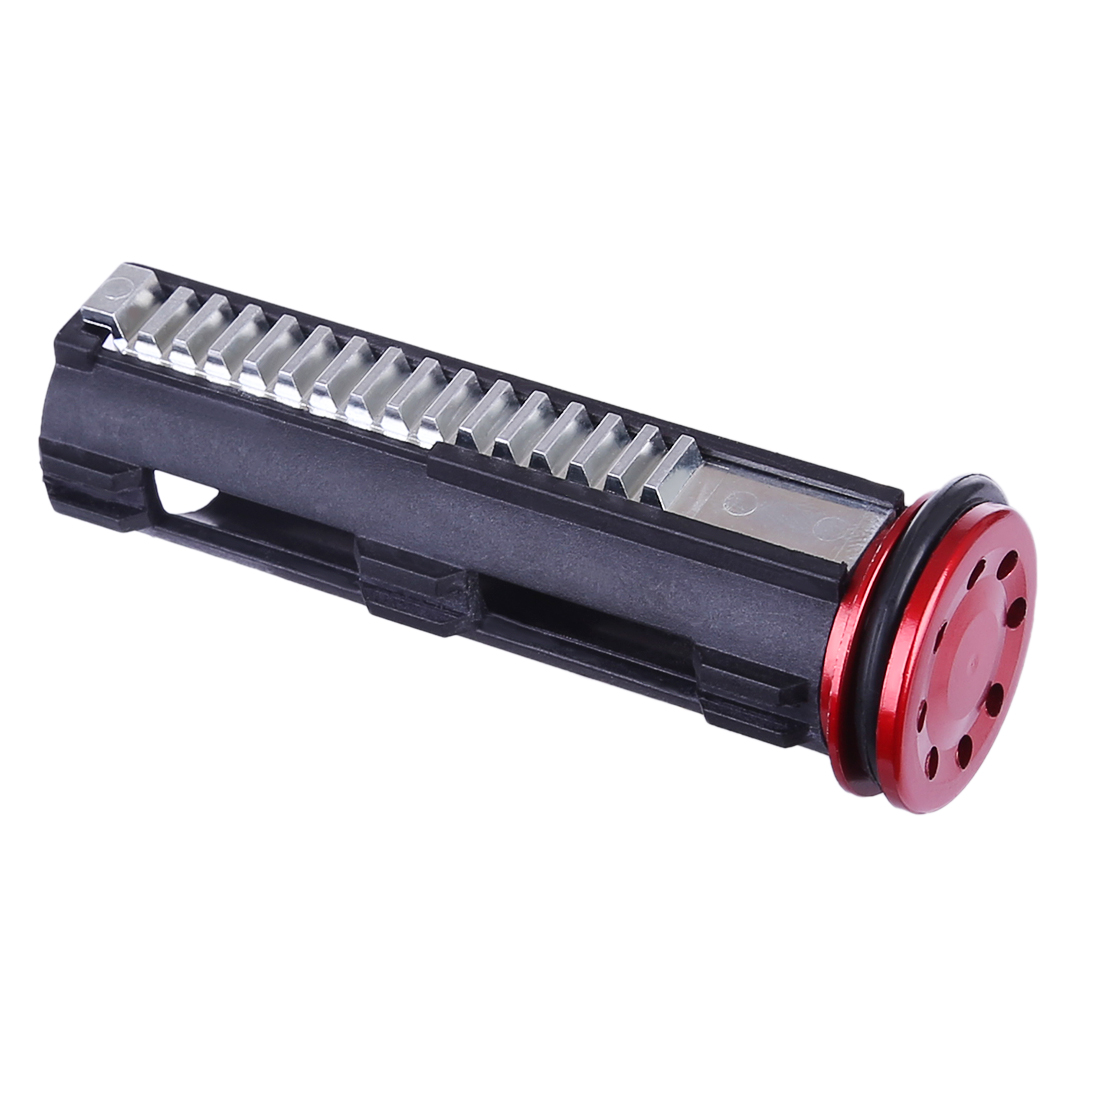 Metal Teeth Nylon Piston And Metal Piston Head For LH Vector Gen.2 Water Gel Beads Blaster - Black